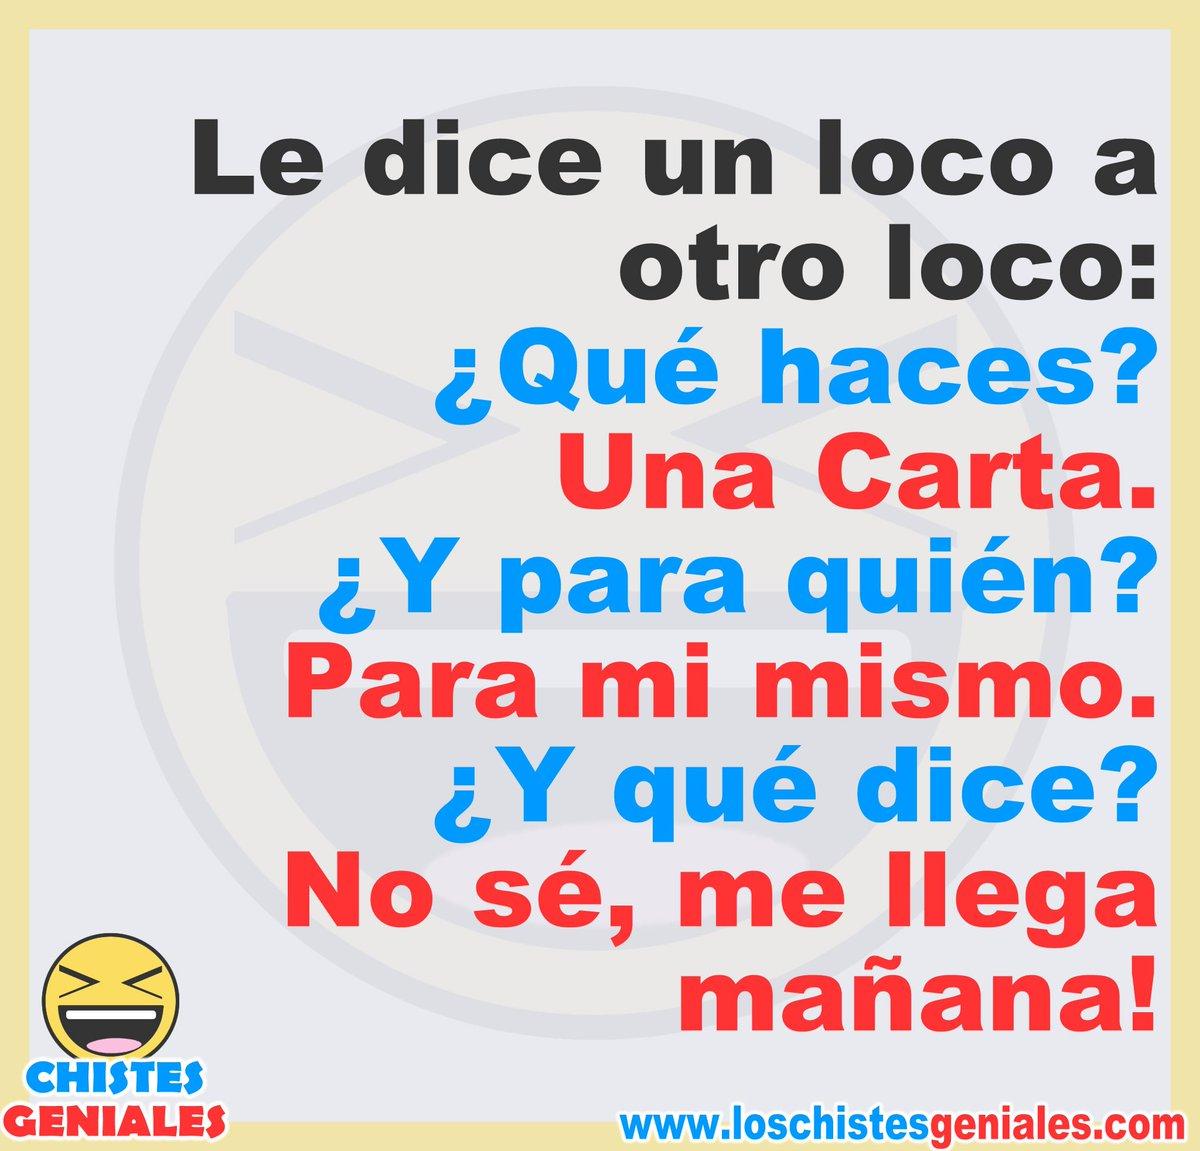 Chiste Los Locos DgS9L0YW0AEQona